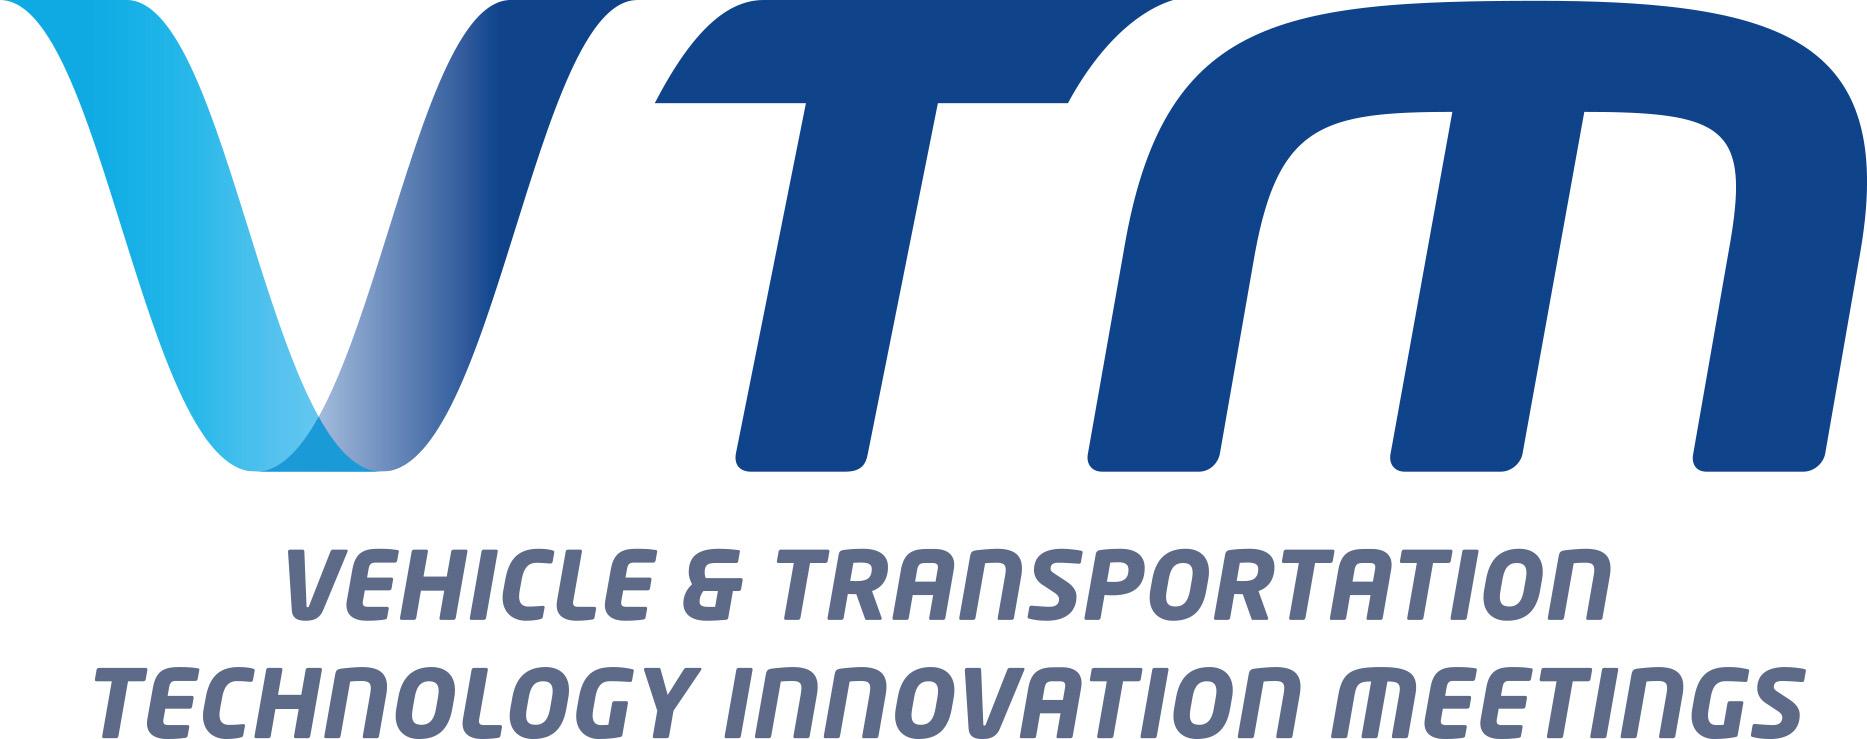 "Partnering Forum ""Vehicle & Transportation Technology Innovation"" in Turin"